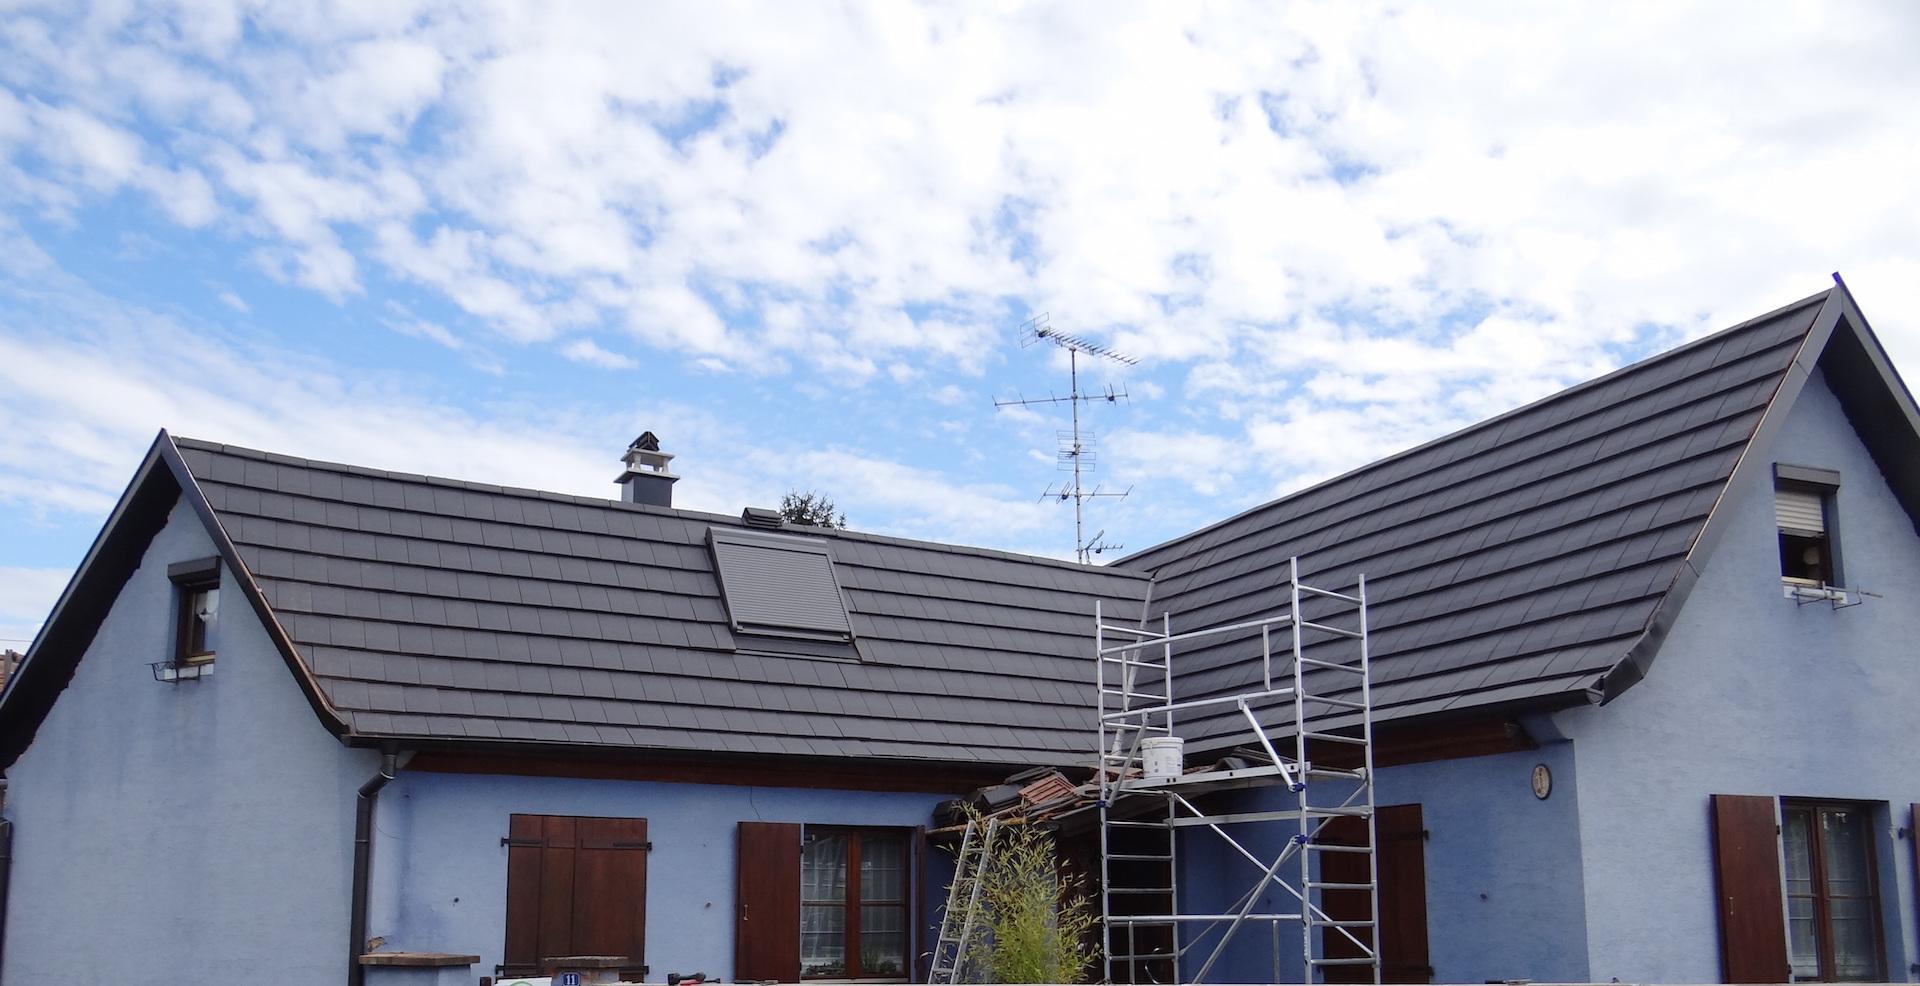 D coration couverture toiture 71 tourcoing solution for Tole isolante pour toiture